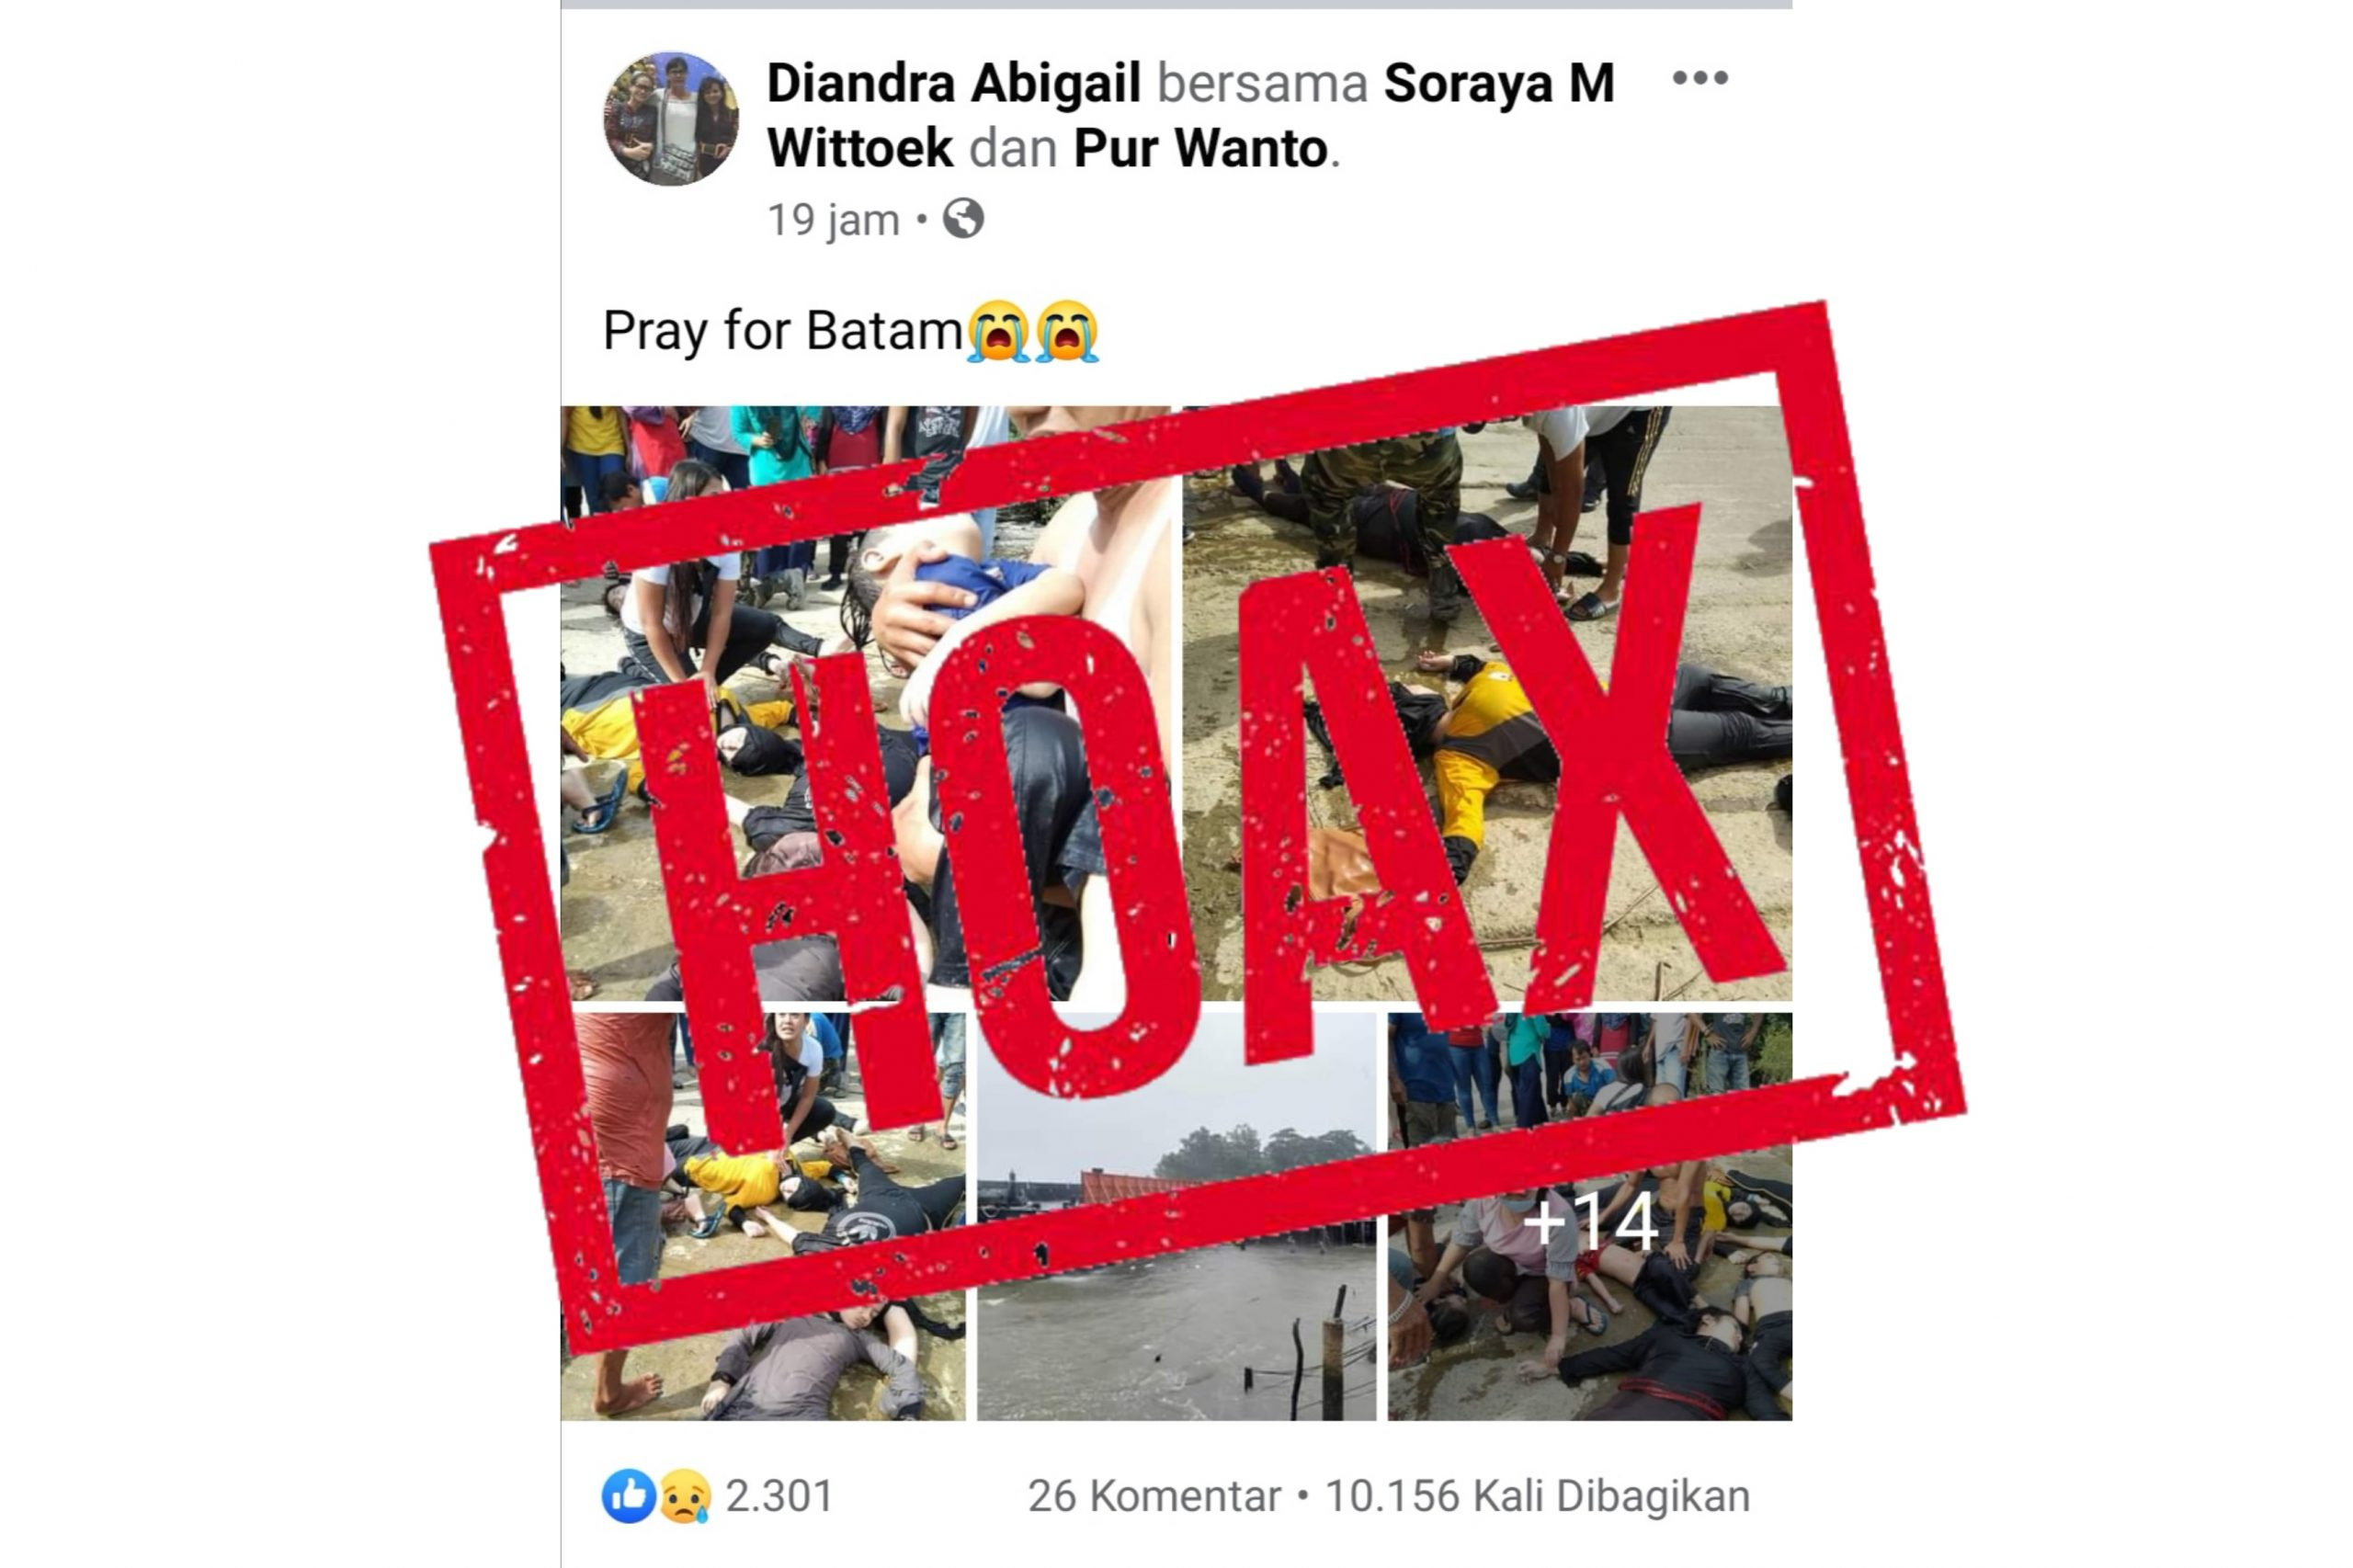 (Facebook Diandra Abigail)